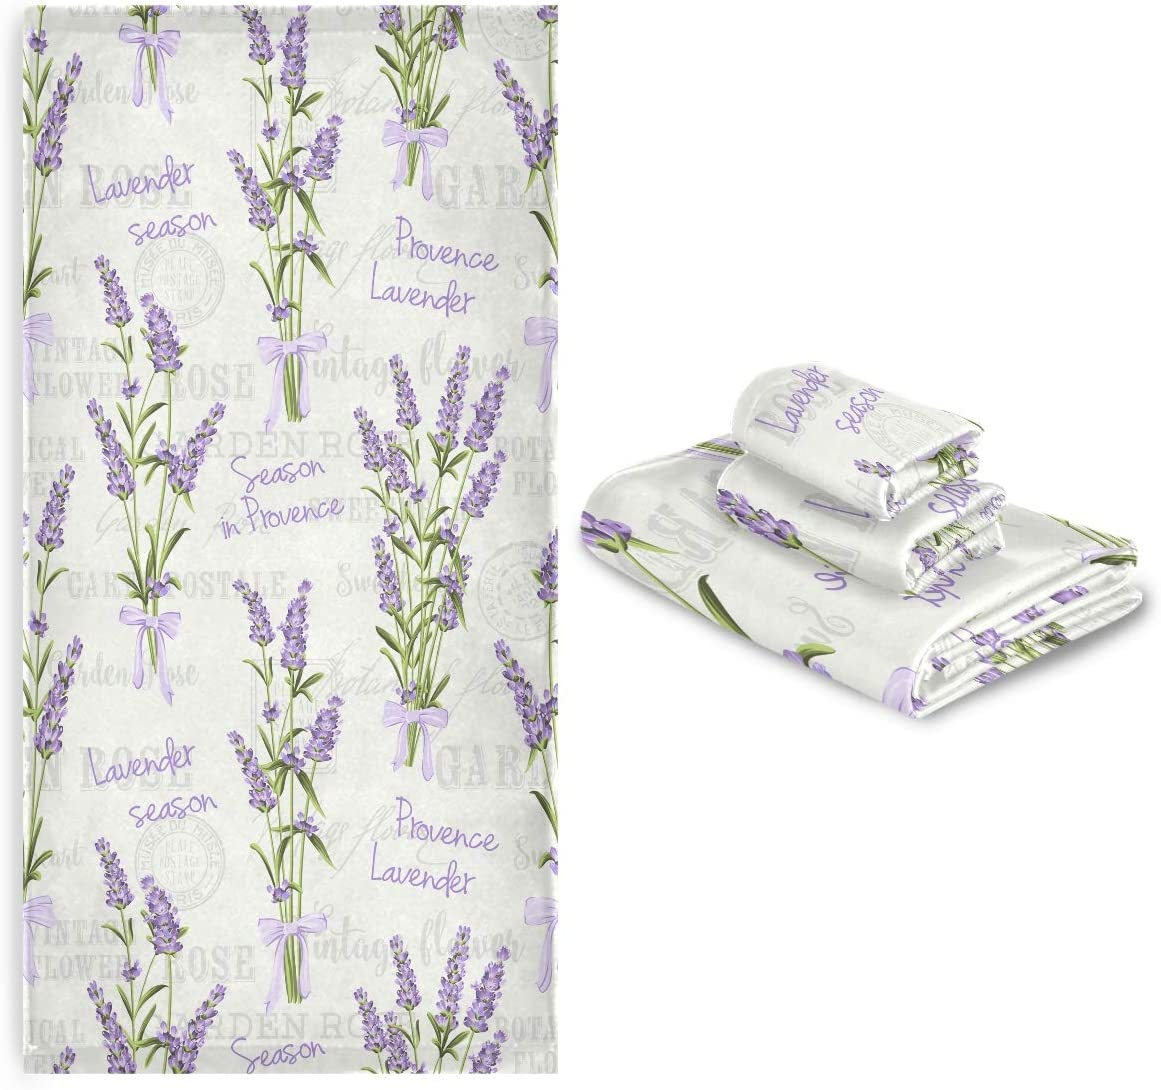 Vdsrup Vintage Lavender low-pricing Towels Set of 3 Flowers Spring Ranking TOP12 Ha Summer